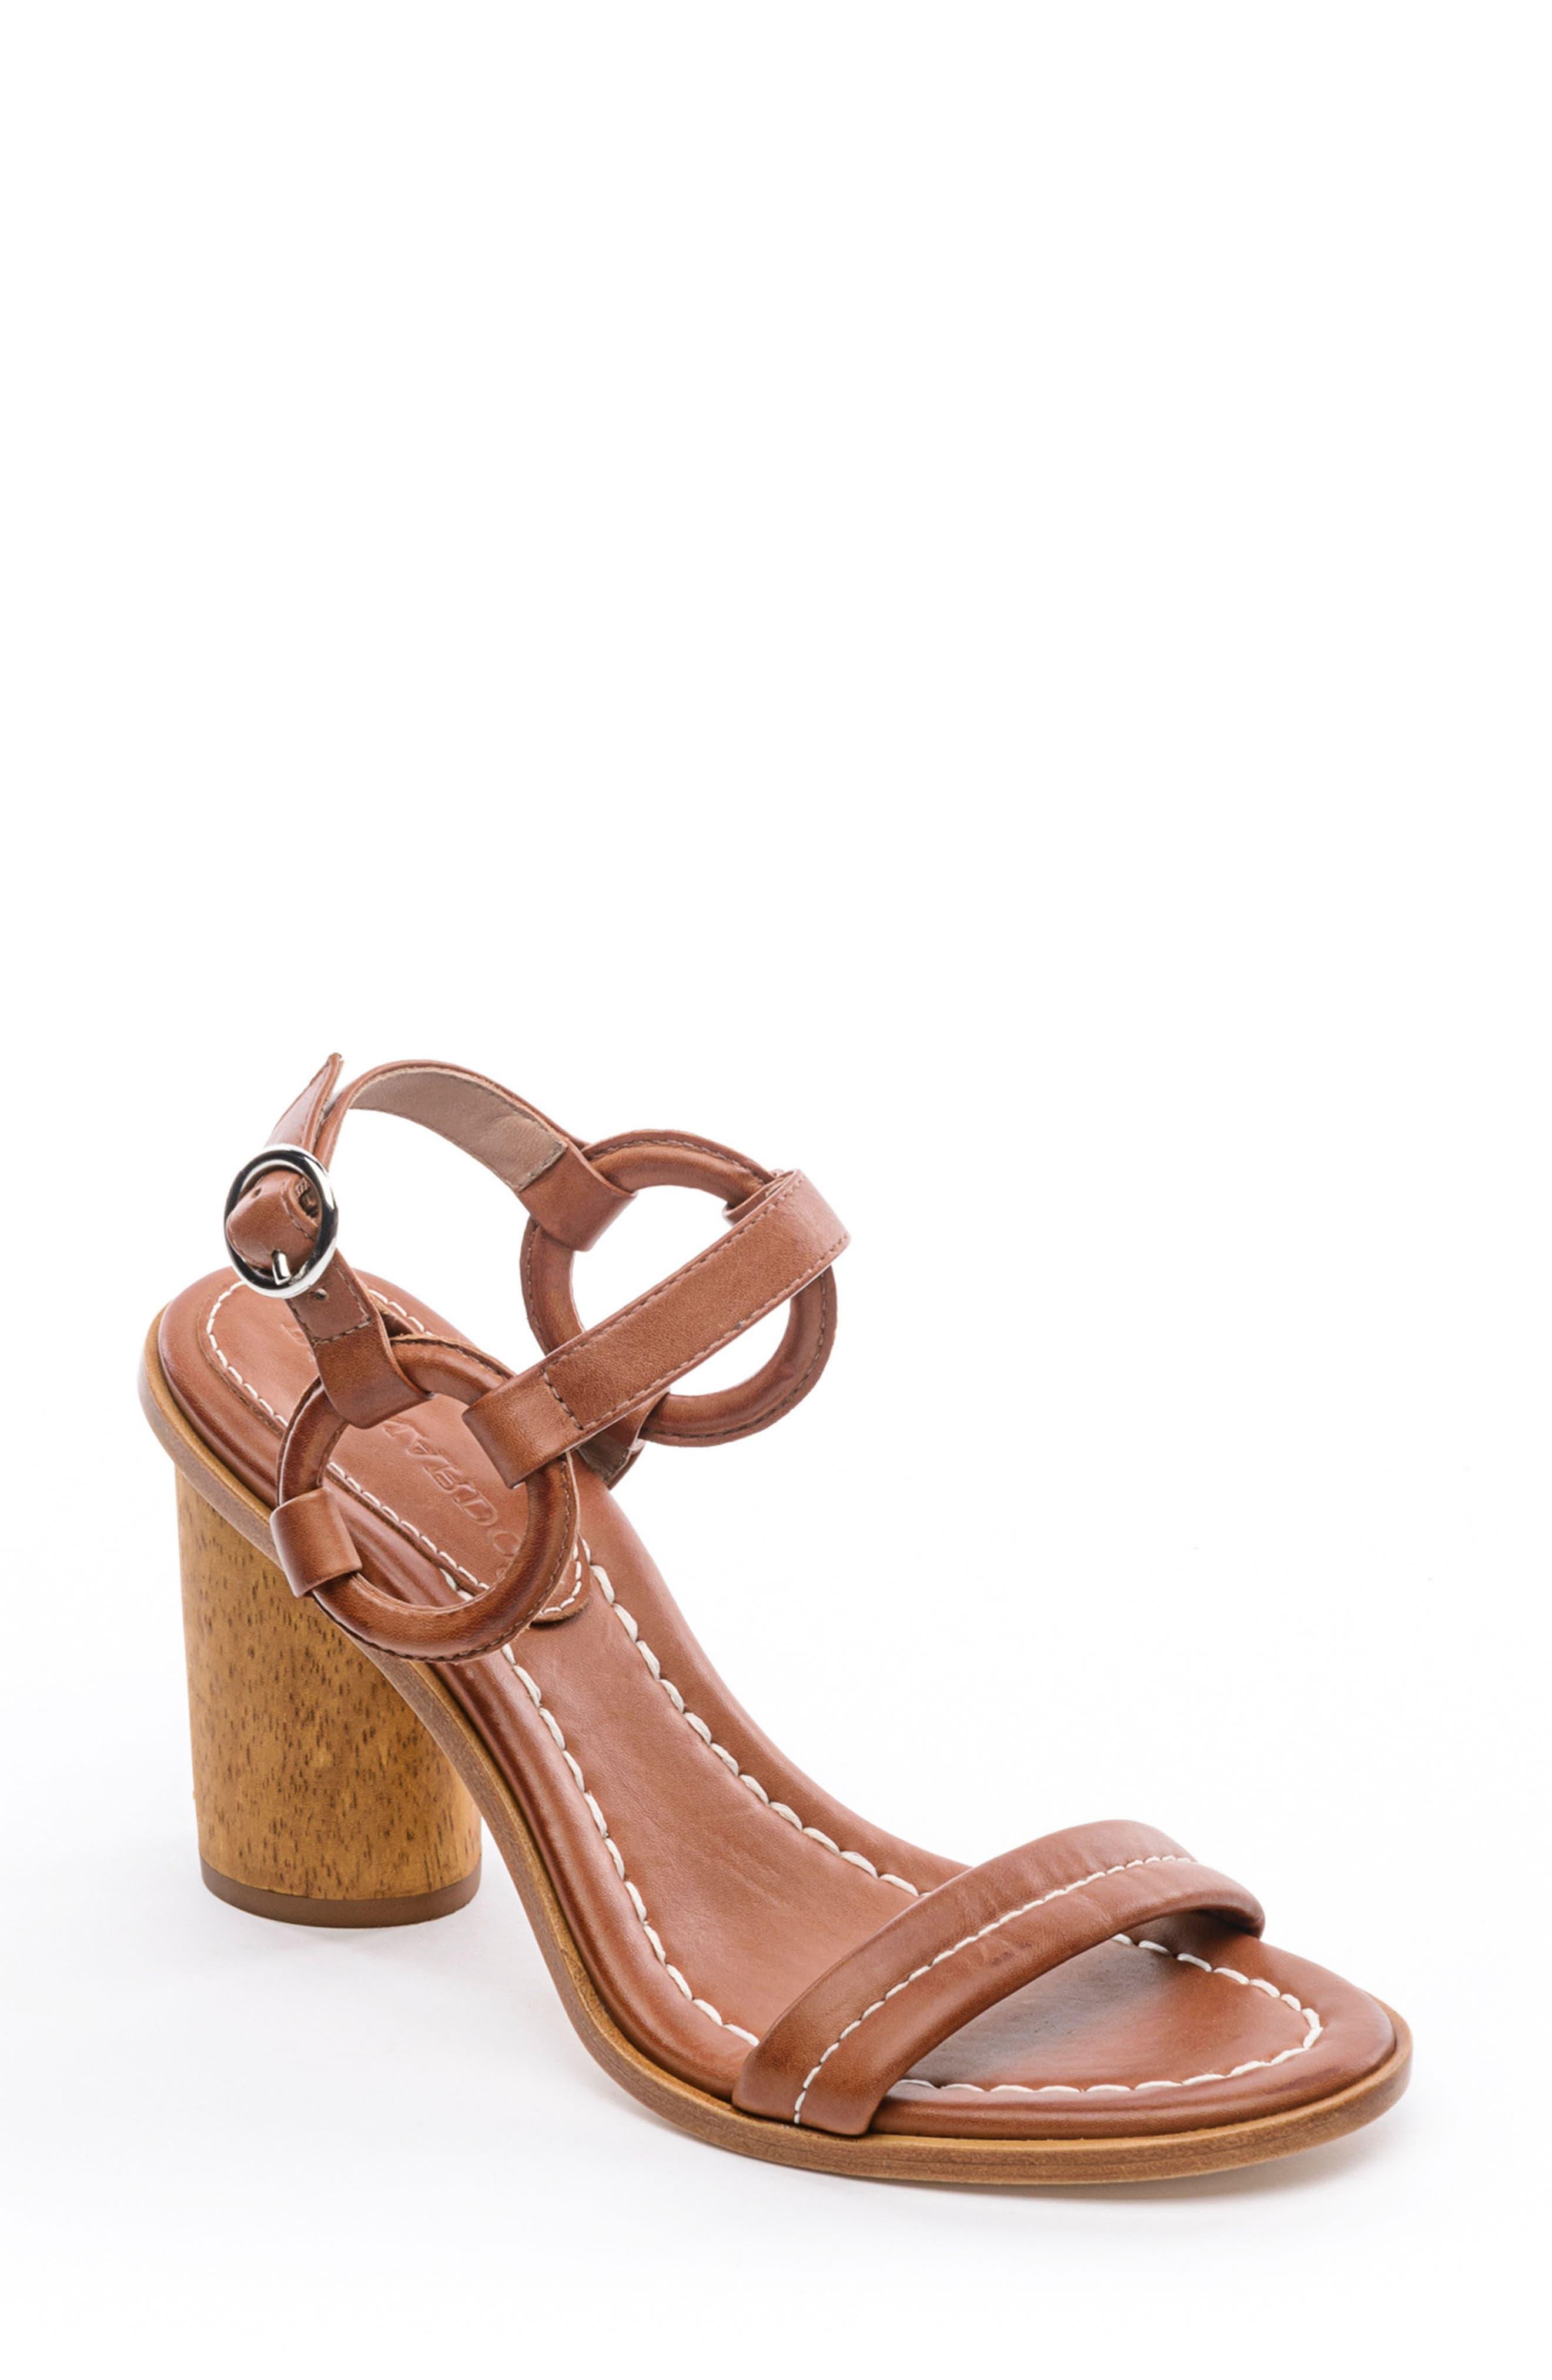 Bernardo Harlow Ankle Strap Sandal, Brown